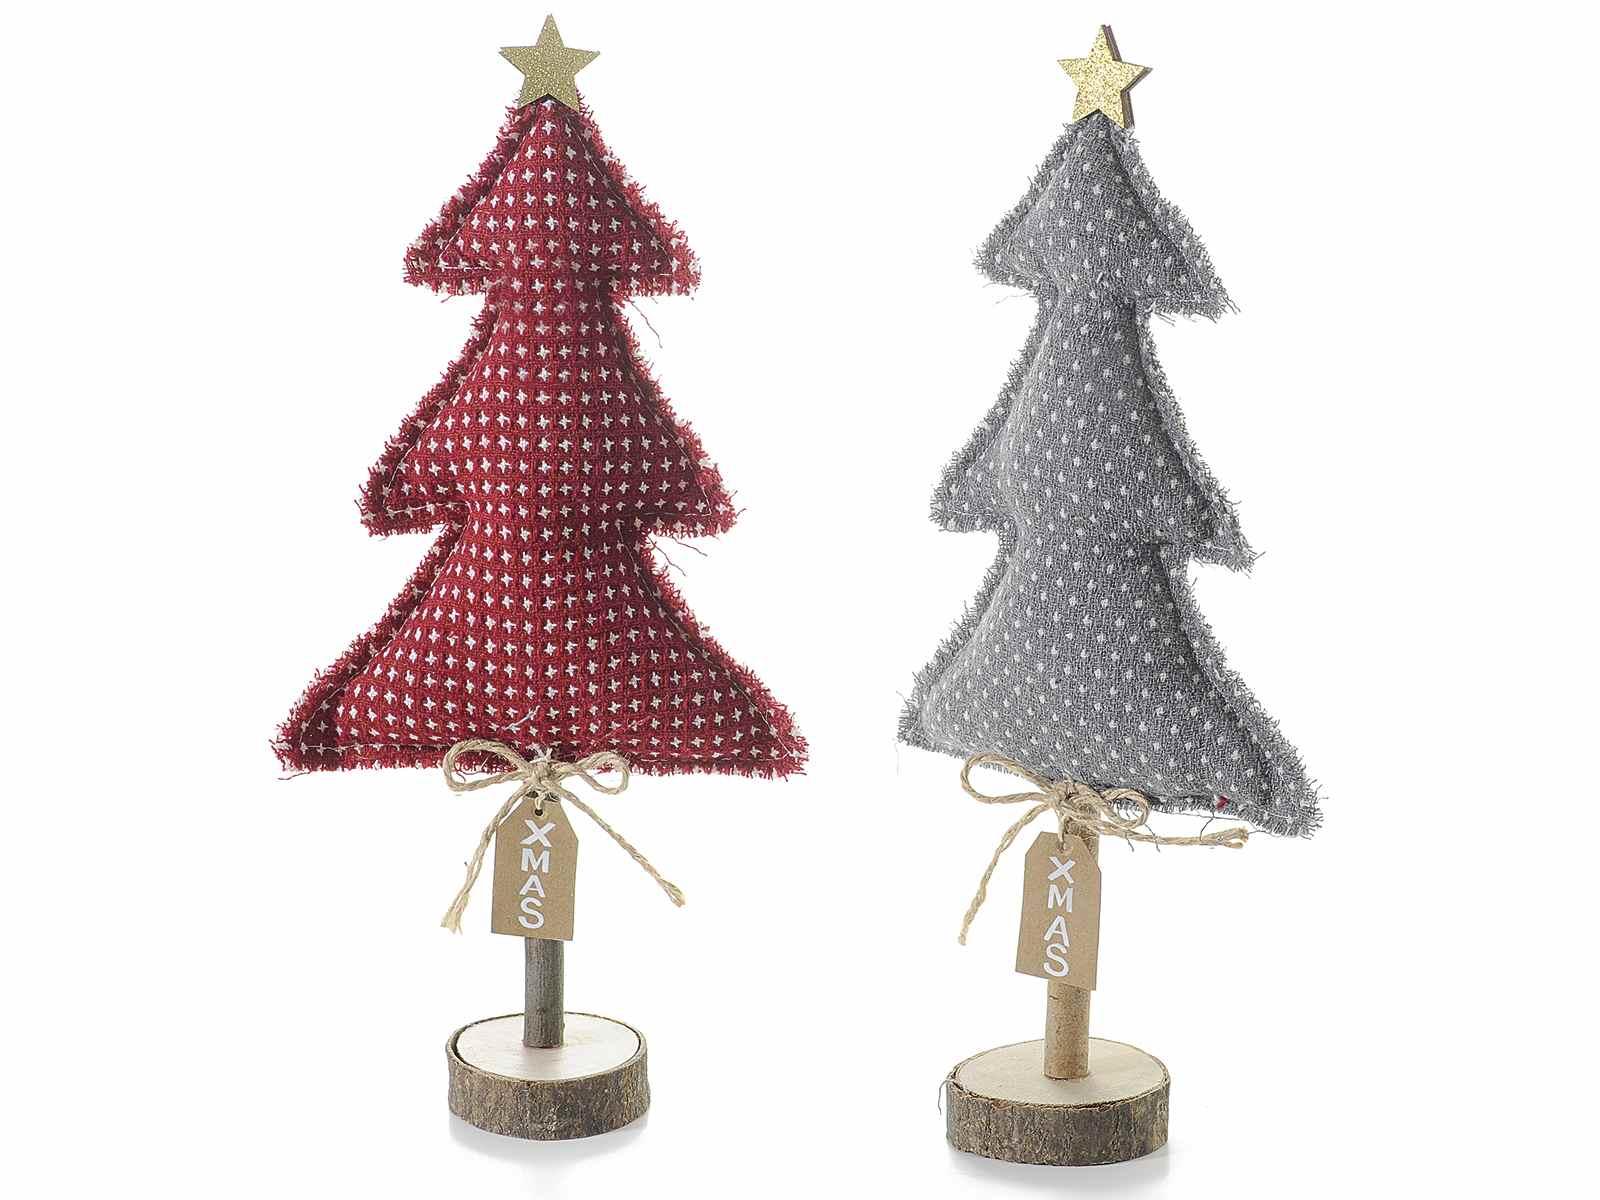 Arbol de navidad de tela podis bolas de navidad de tela - Arboles de navidad de tela ...